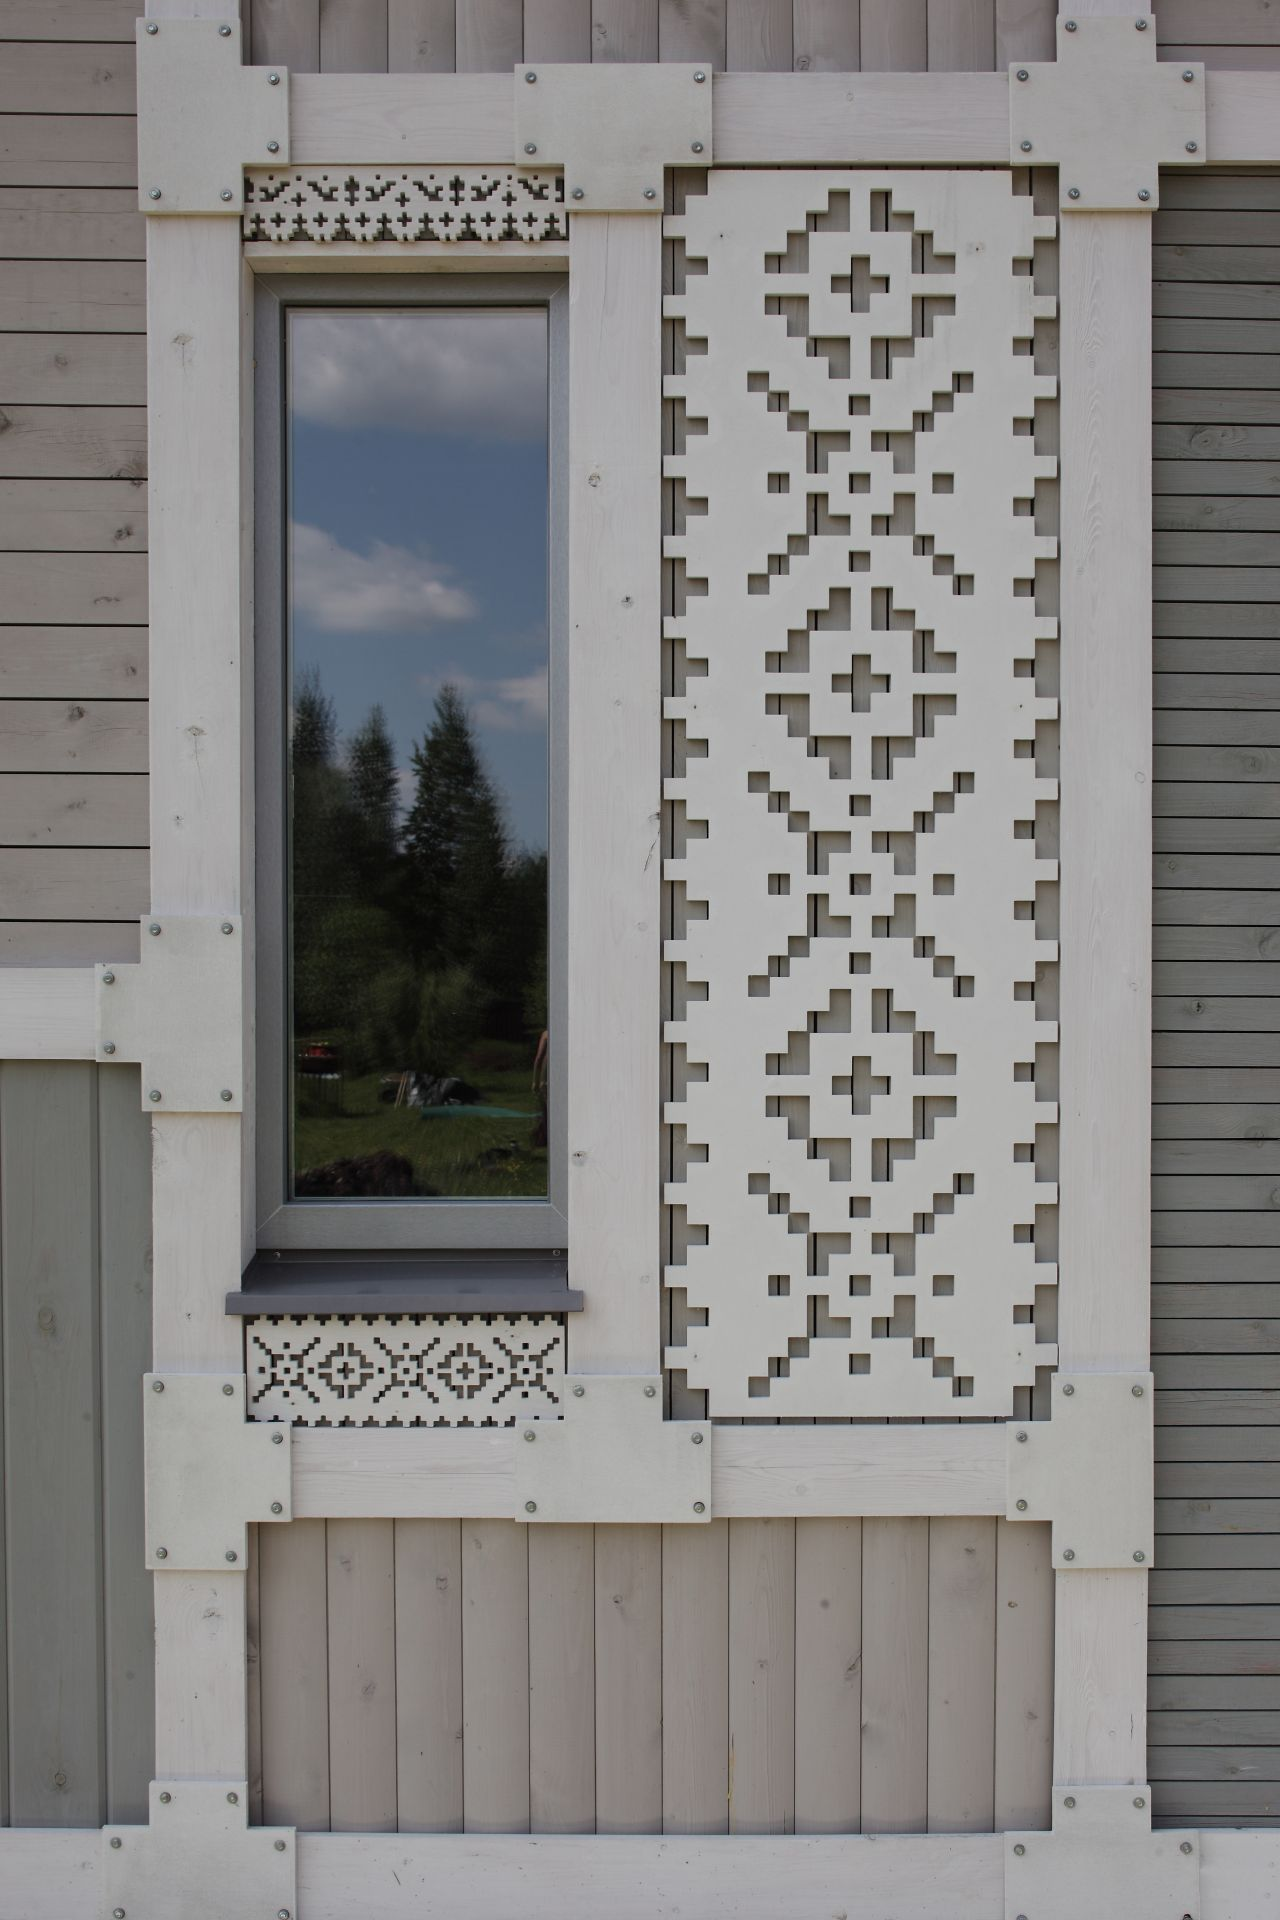 51ef0dd0e8e44ea5b700008d_deco-pattern-house-peter-kostelov_kostelov_deco_pattern_facade_011